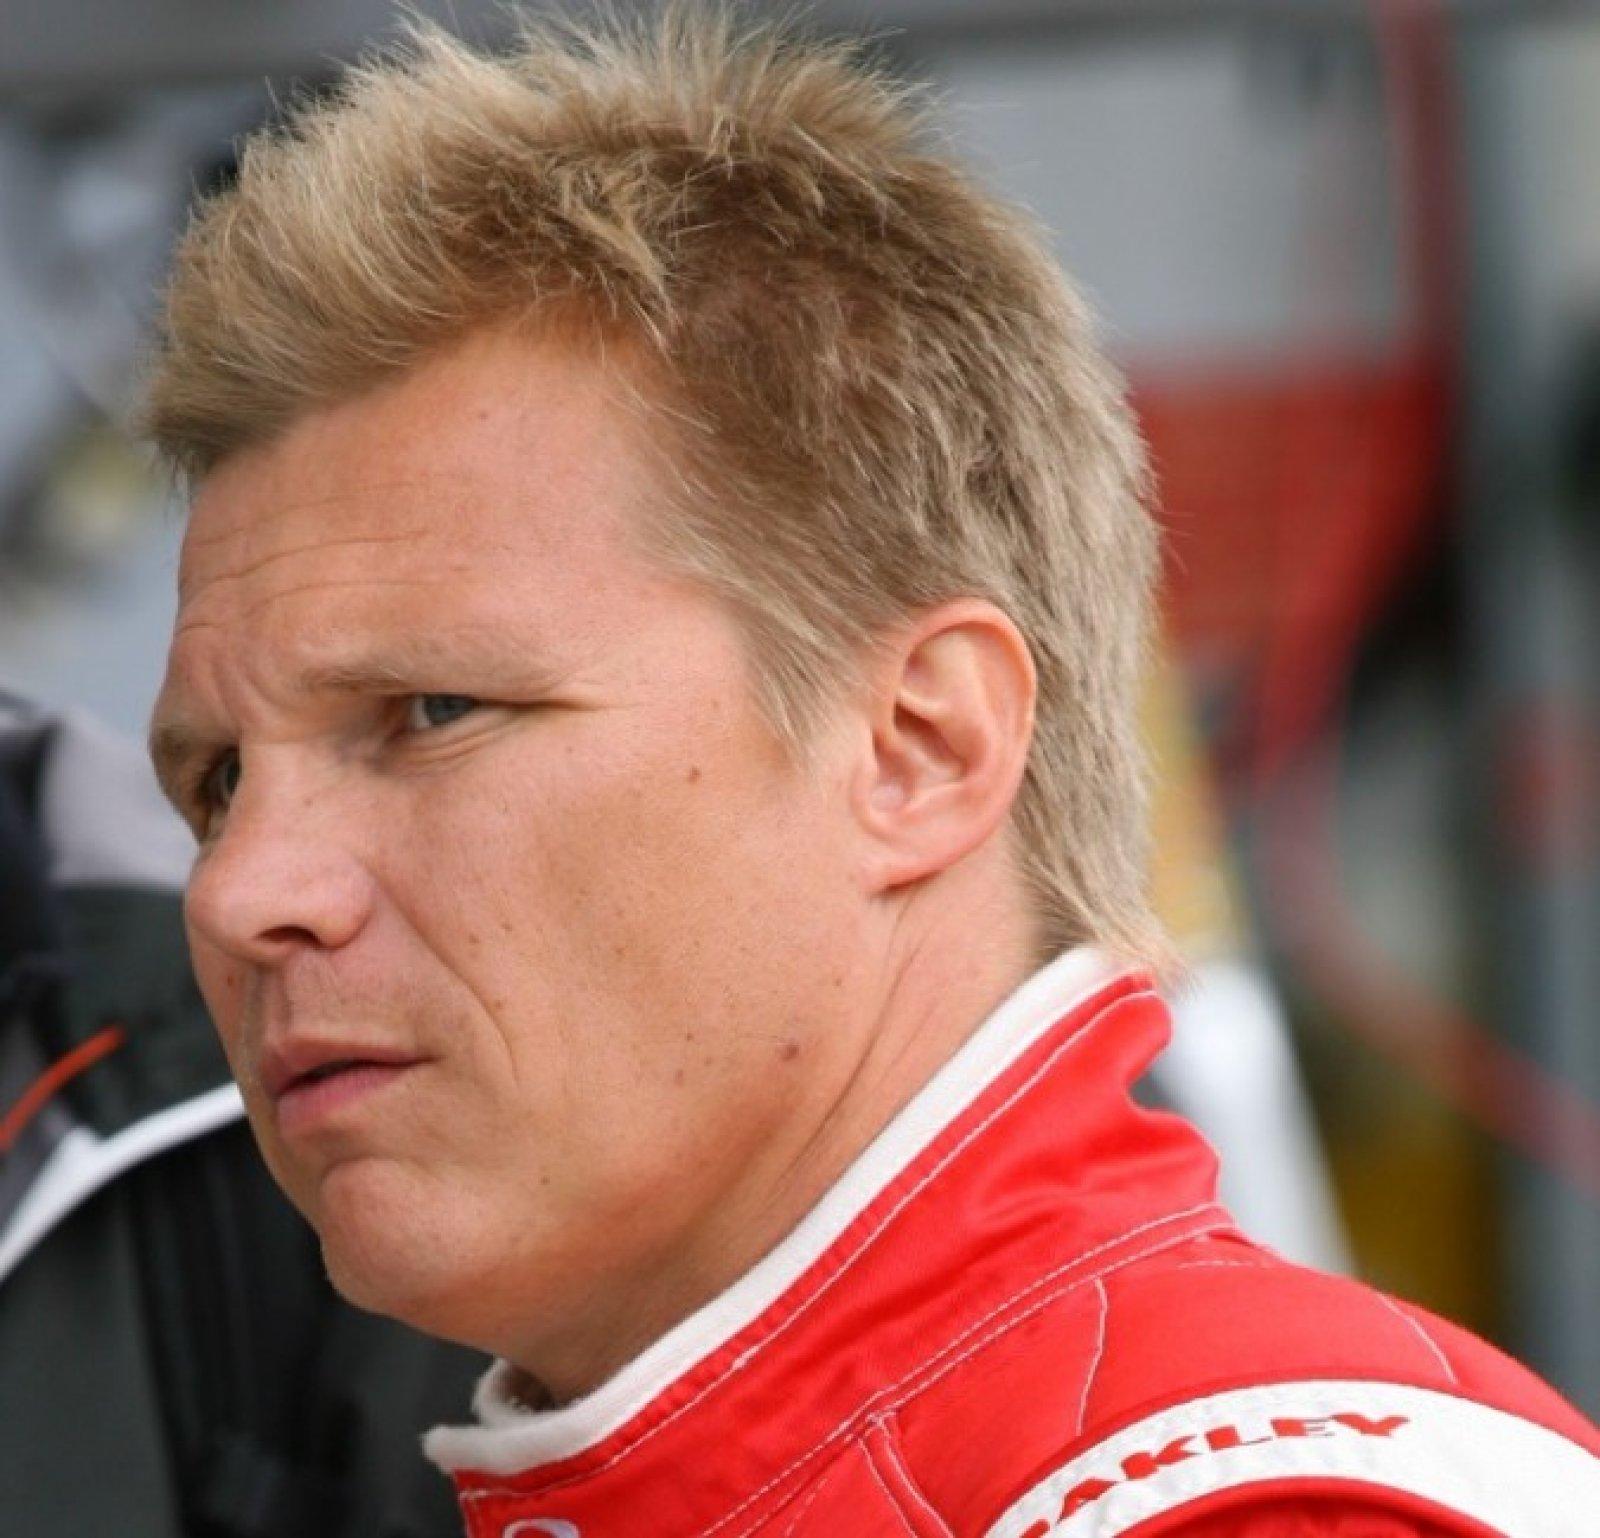 Mika Salo joins Silverstone grid!